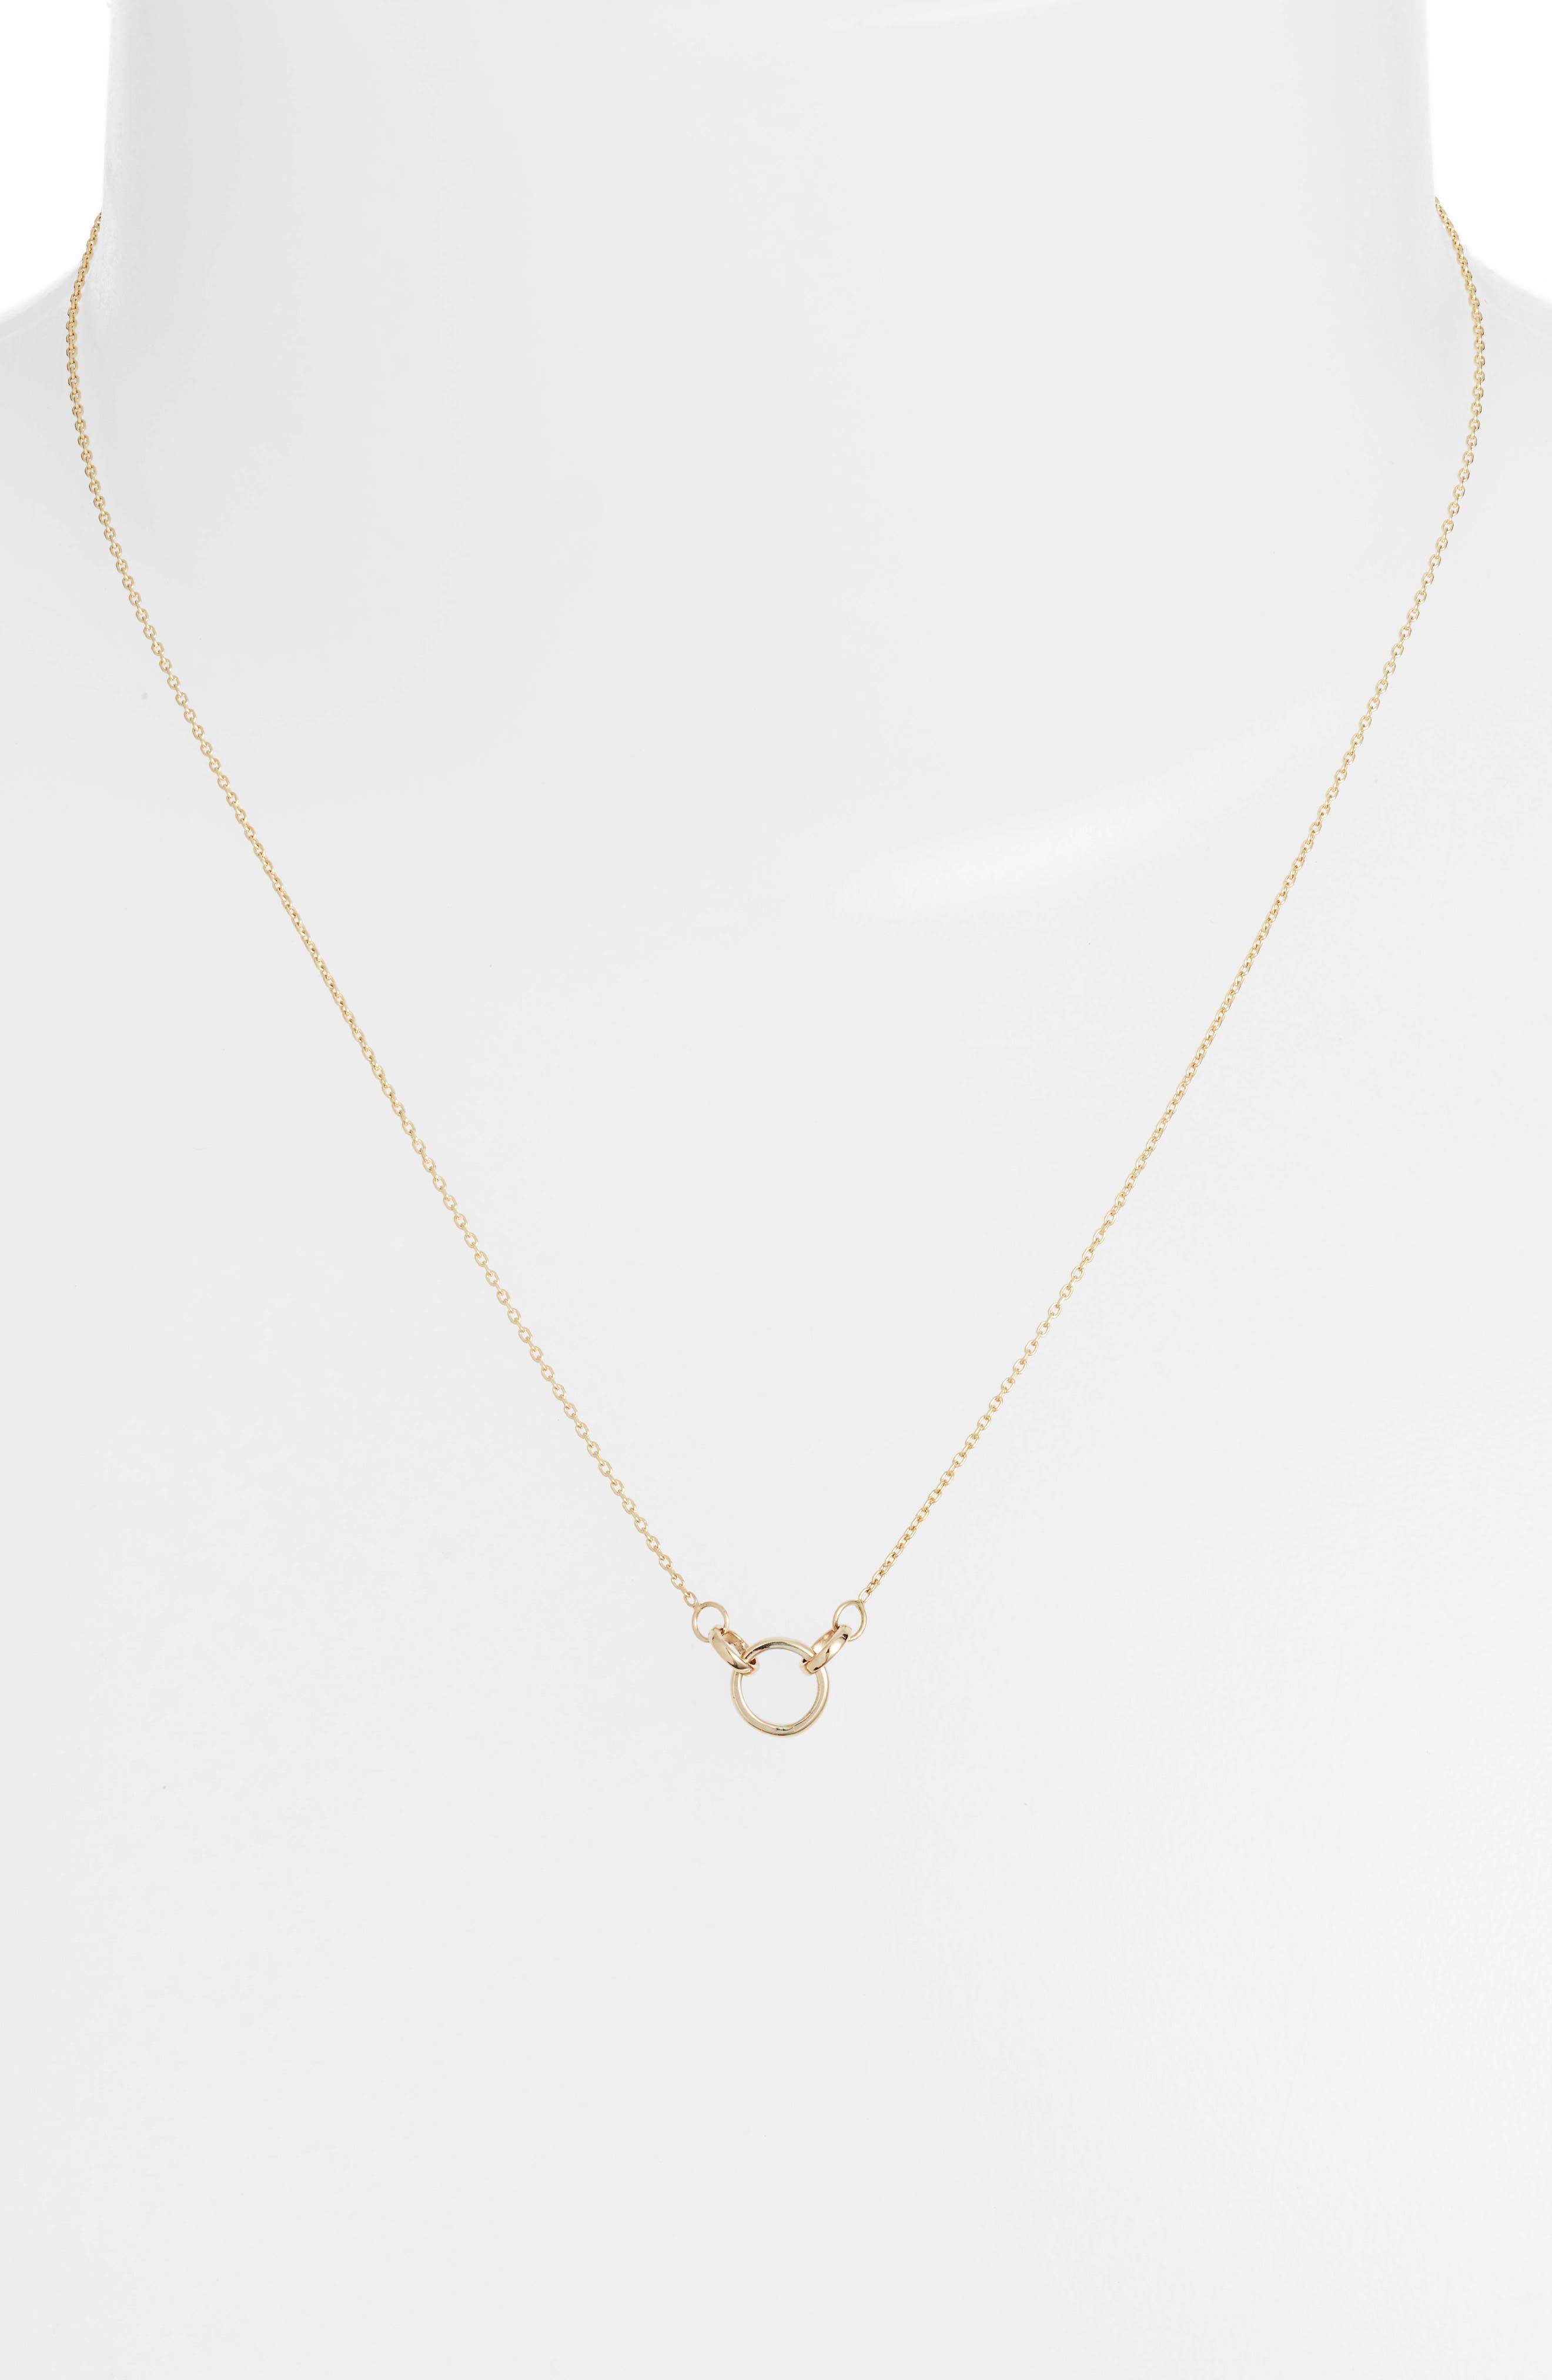 Heart of Diamond Necklace,                             Alternate thumbnail 2, color,                             710